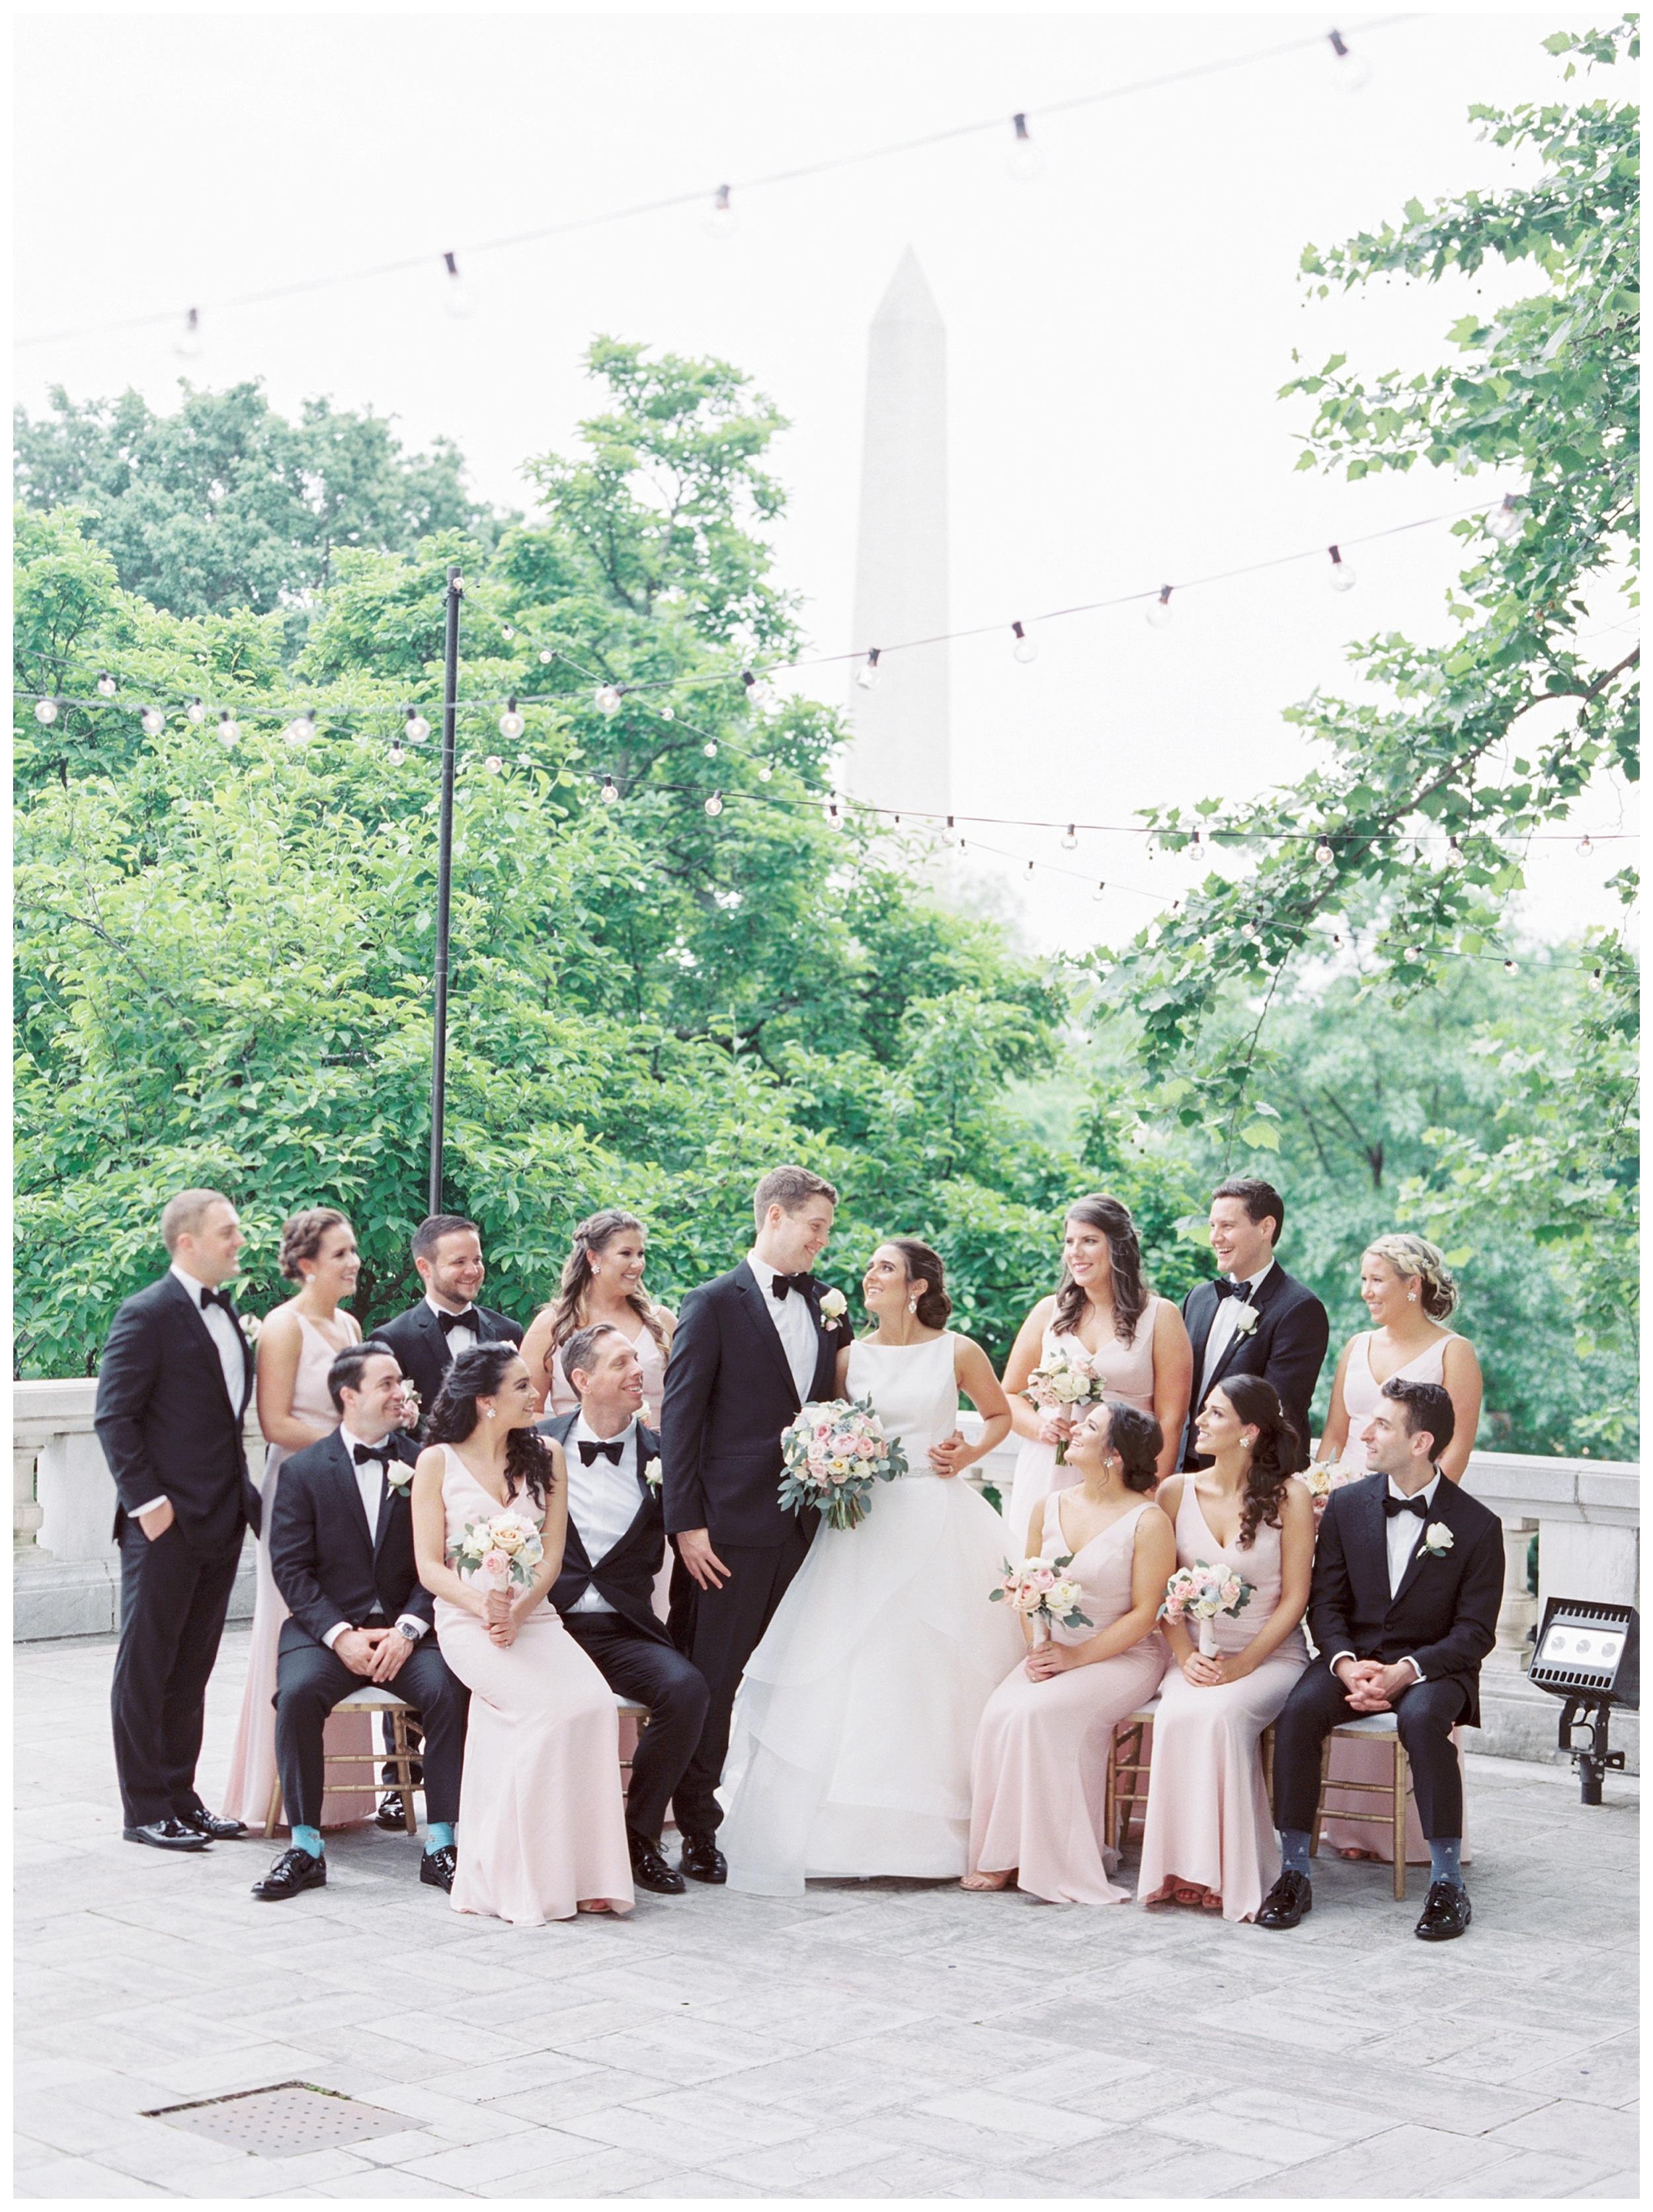 DAR Constitution Hall Wedding Wedding | Daughters of the American Revolution Wedding | District of Columbia Film Wedding Photographer Kir Tuben_0086.jpg